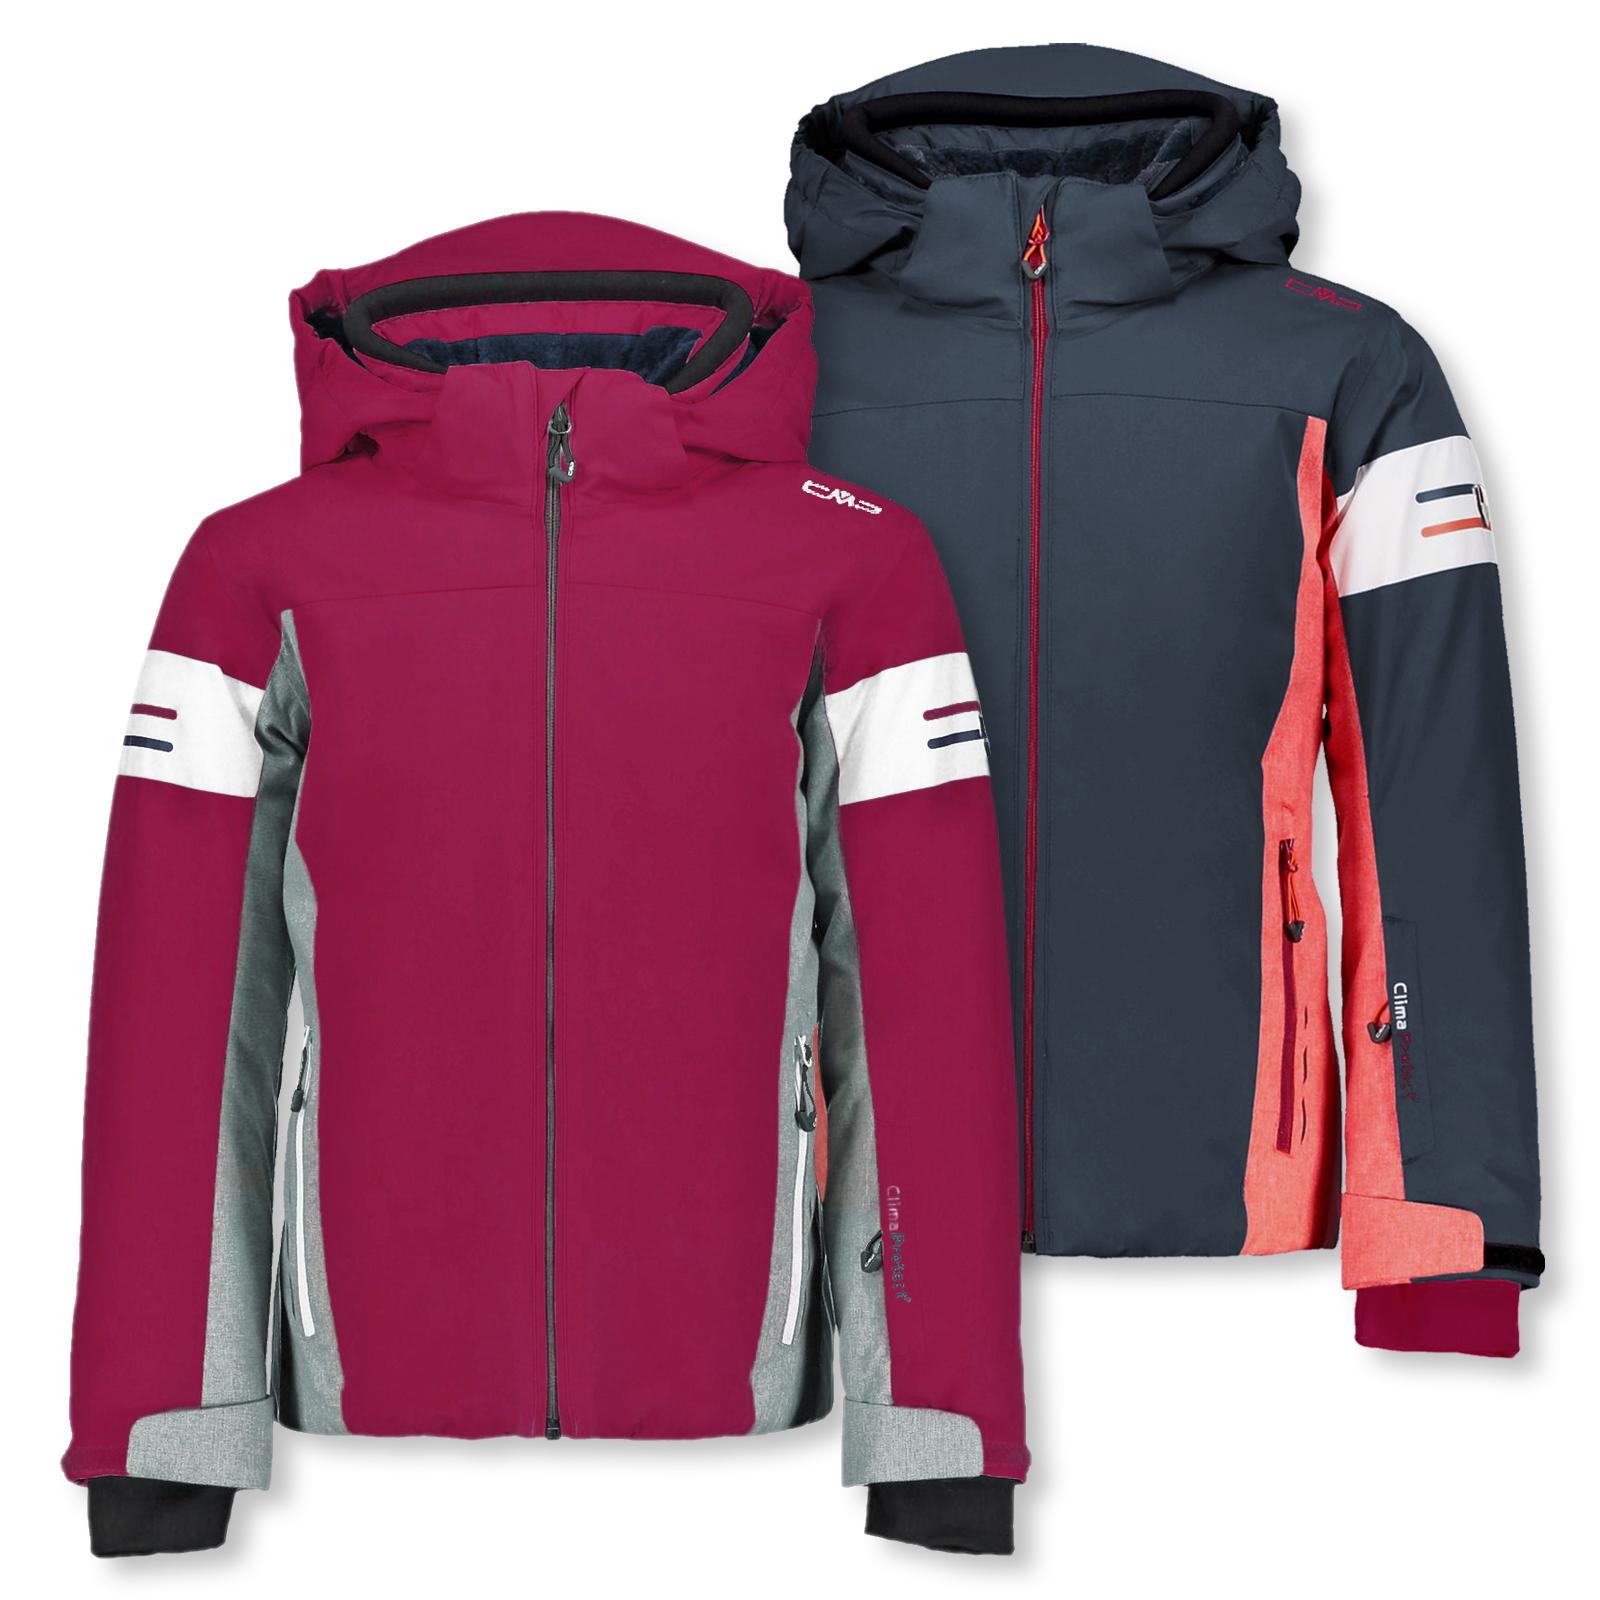 Skijacke Winterjacke Girl Snaps Hood Jacket Farbwahl Bonvenon